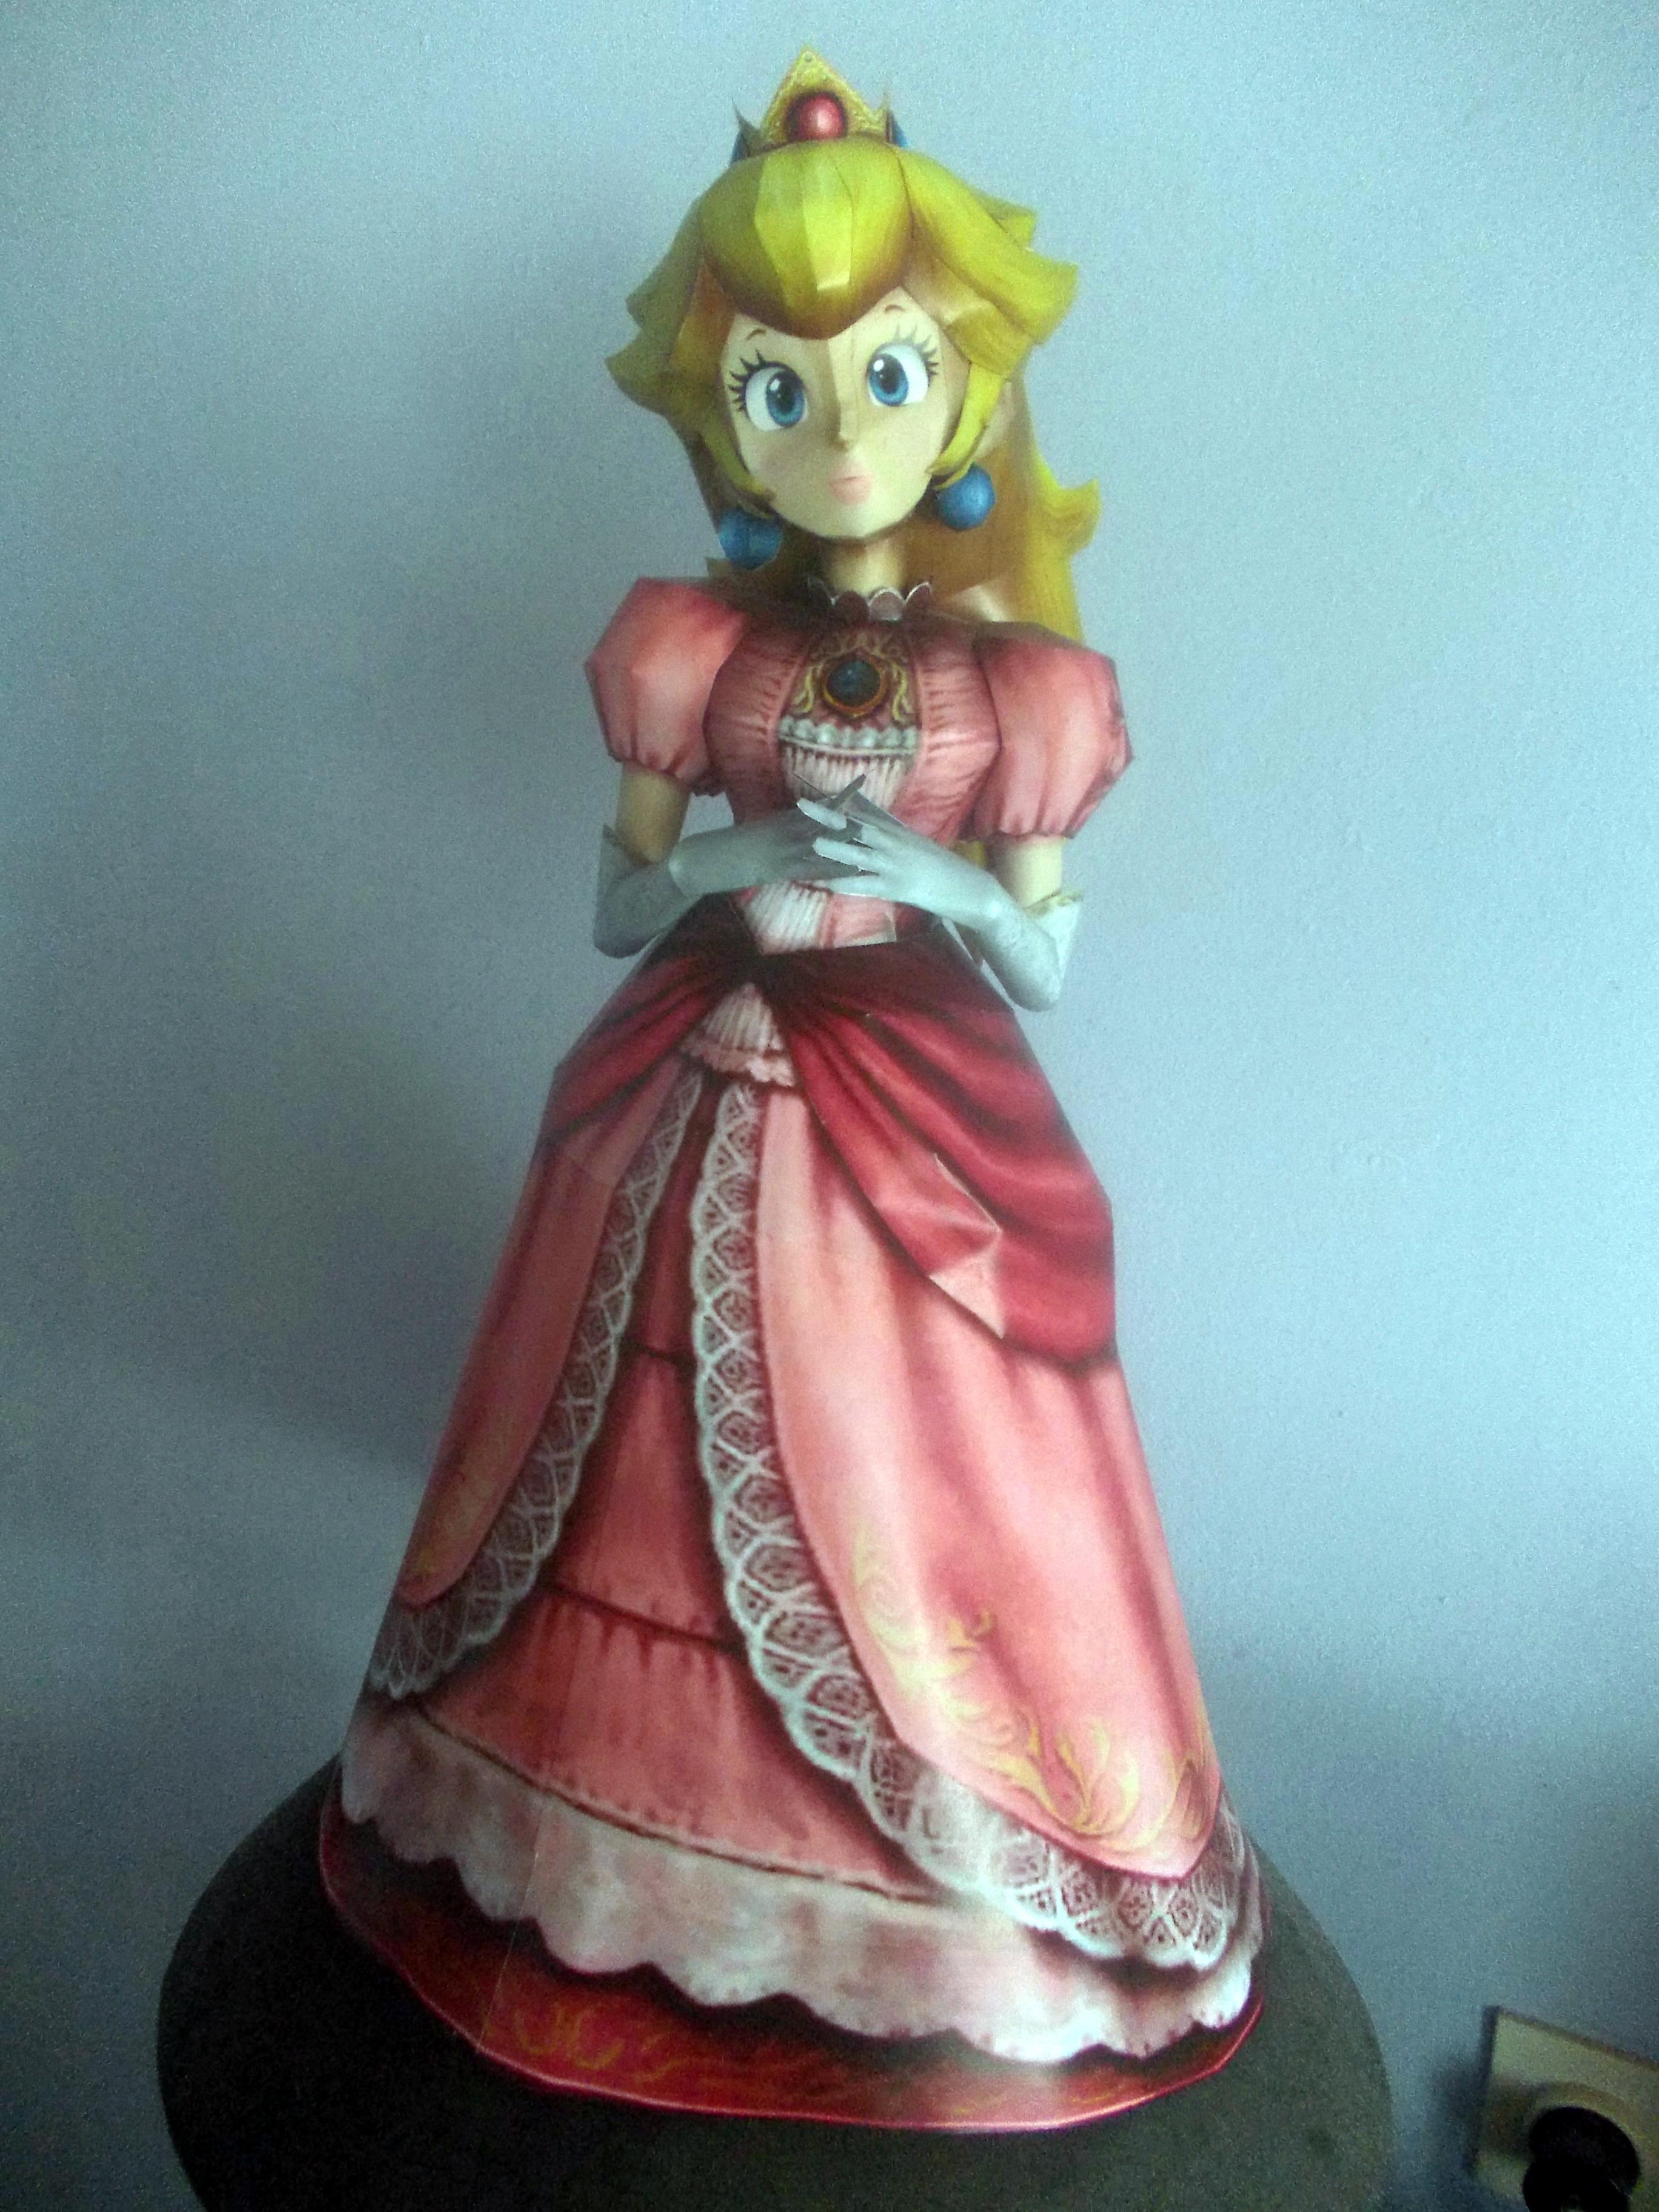 Princess Peach Papercraft by Sabi996